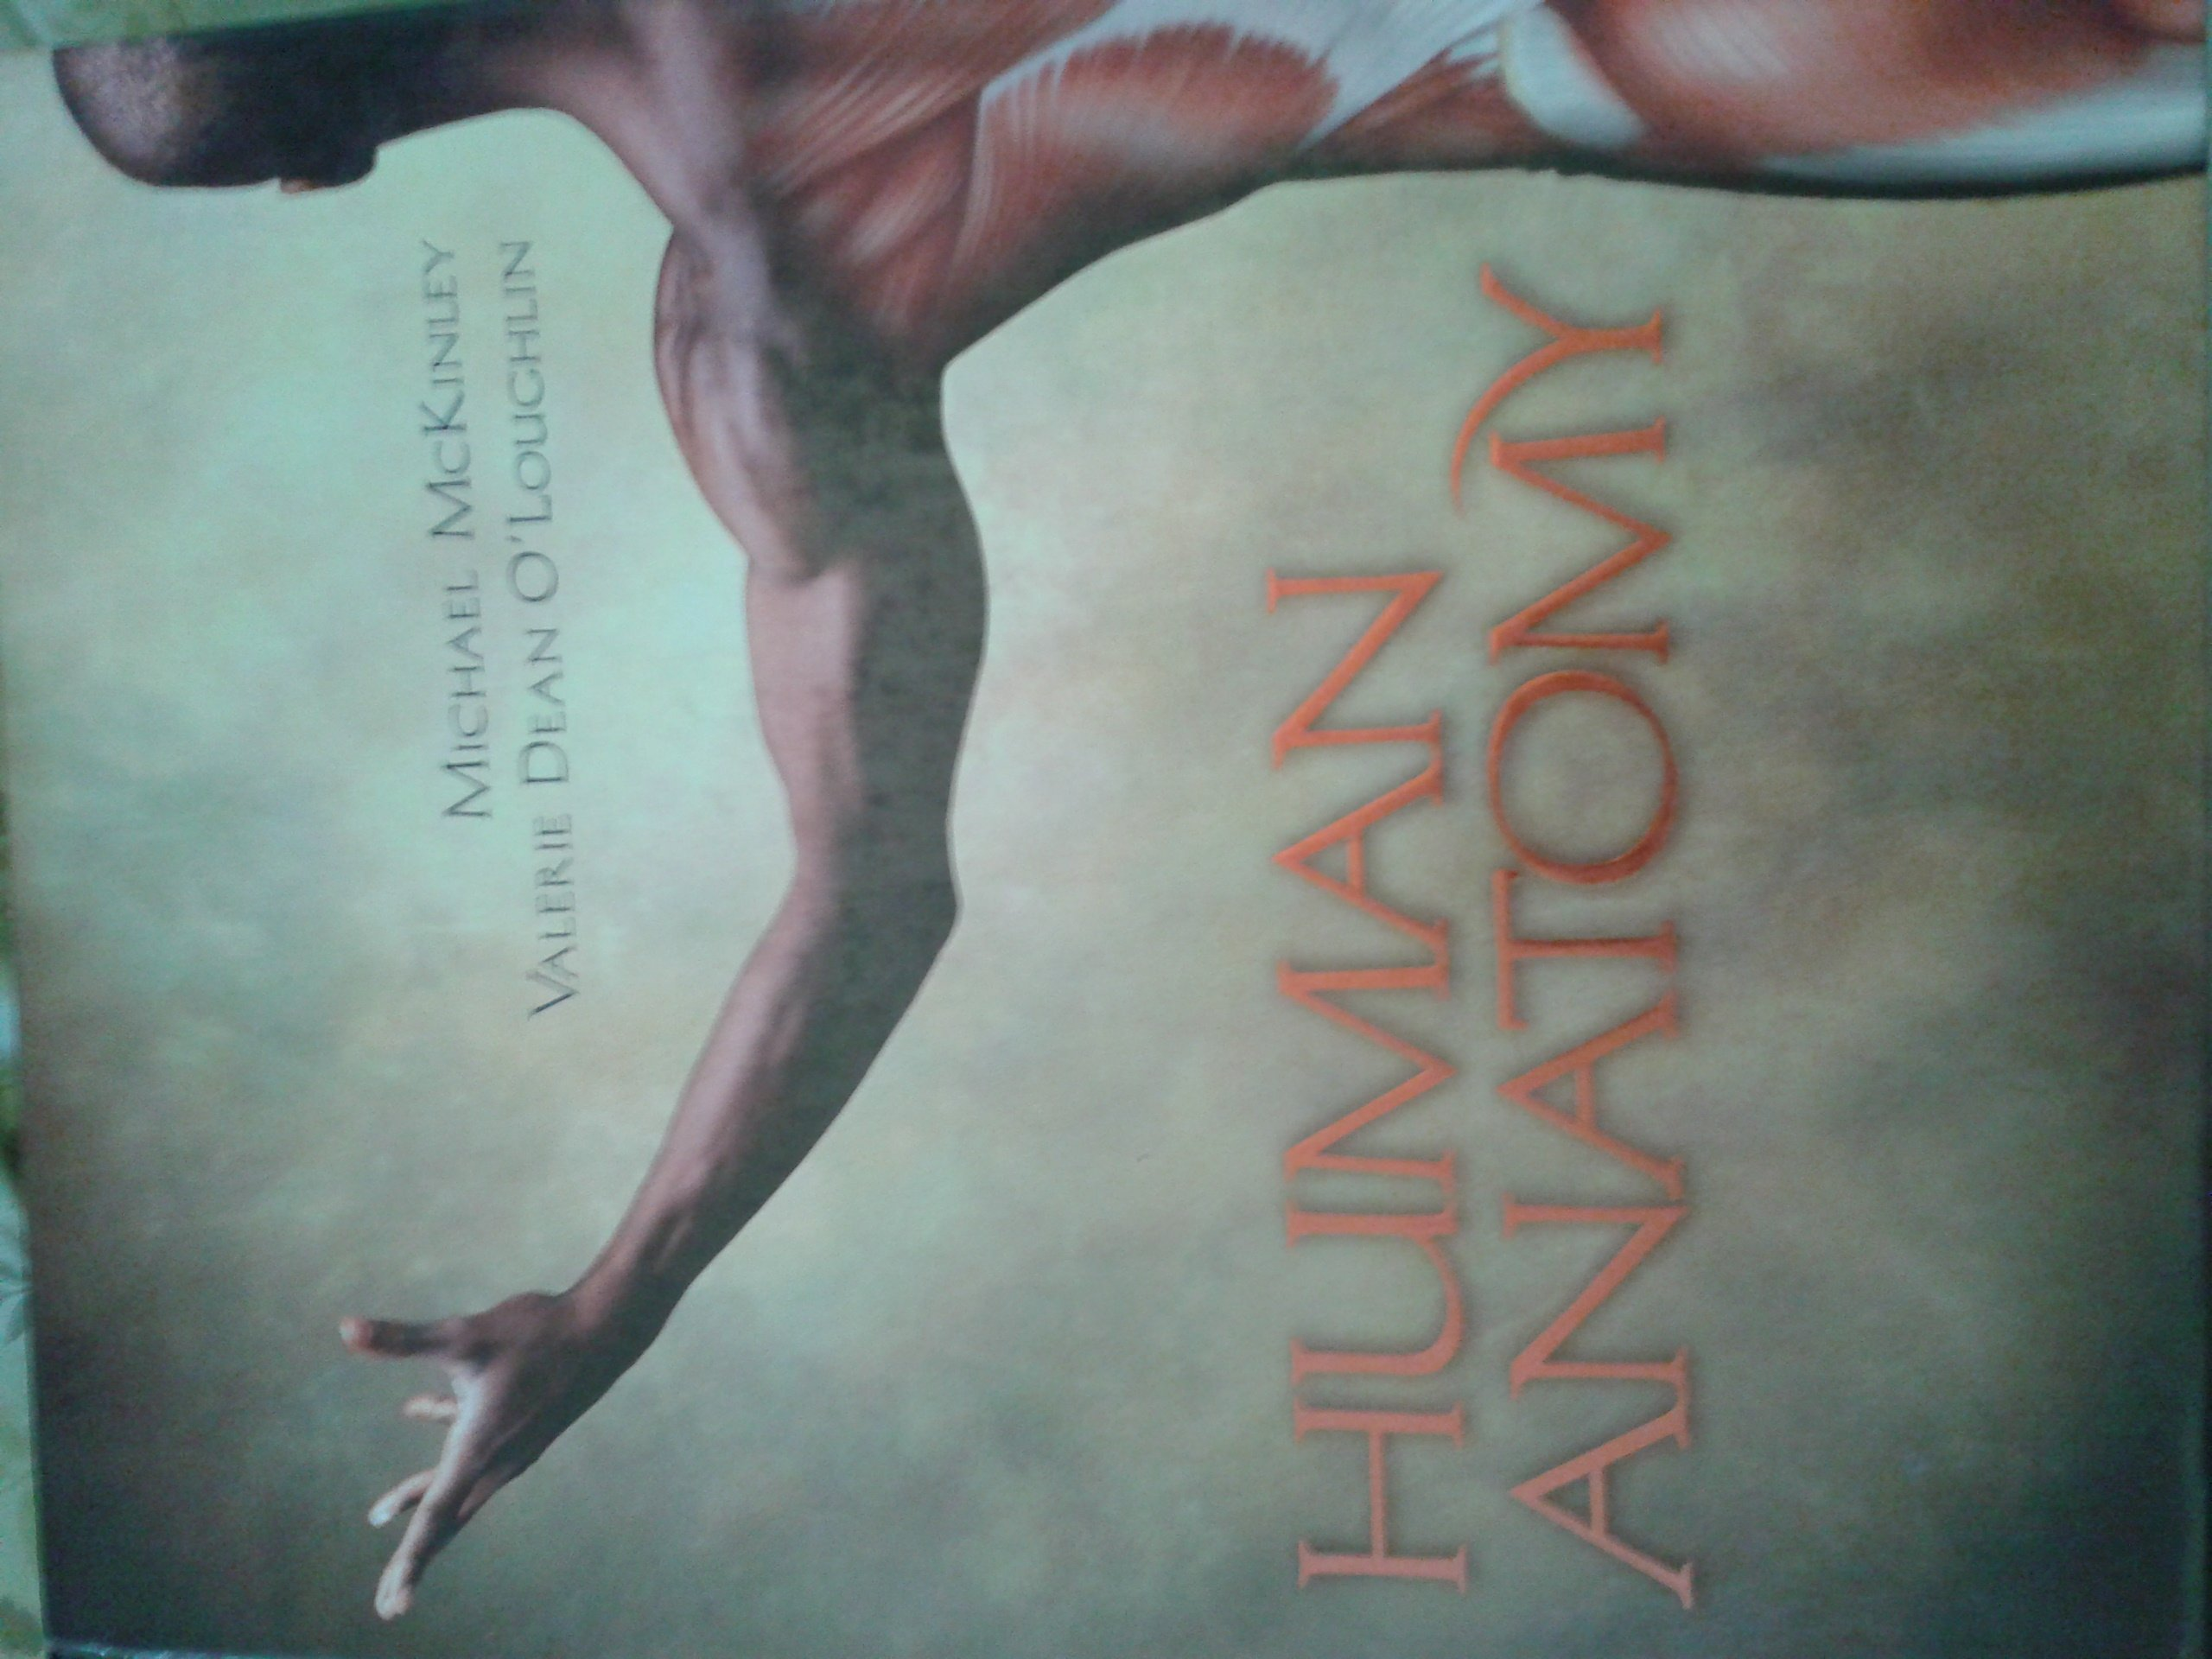 Human Anatomy Valerie Dean Mcki Michael Poloughlin